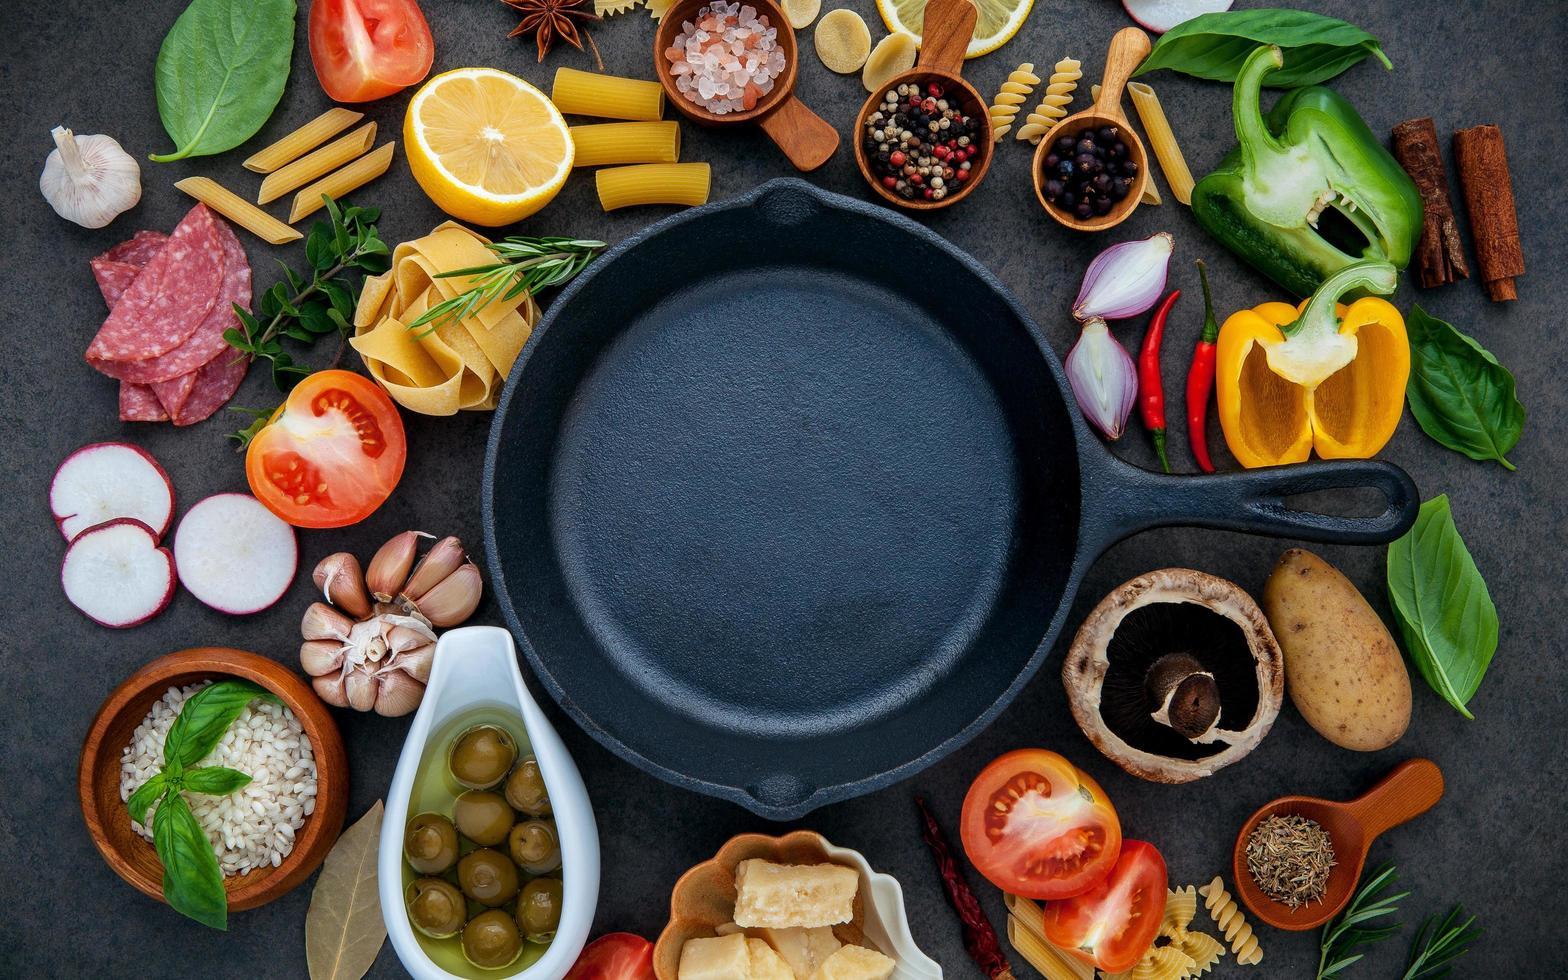 stekpanna med matlagningsingredienser foto